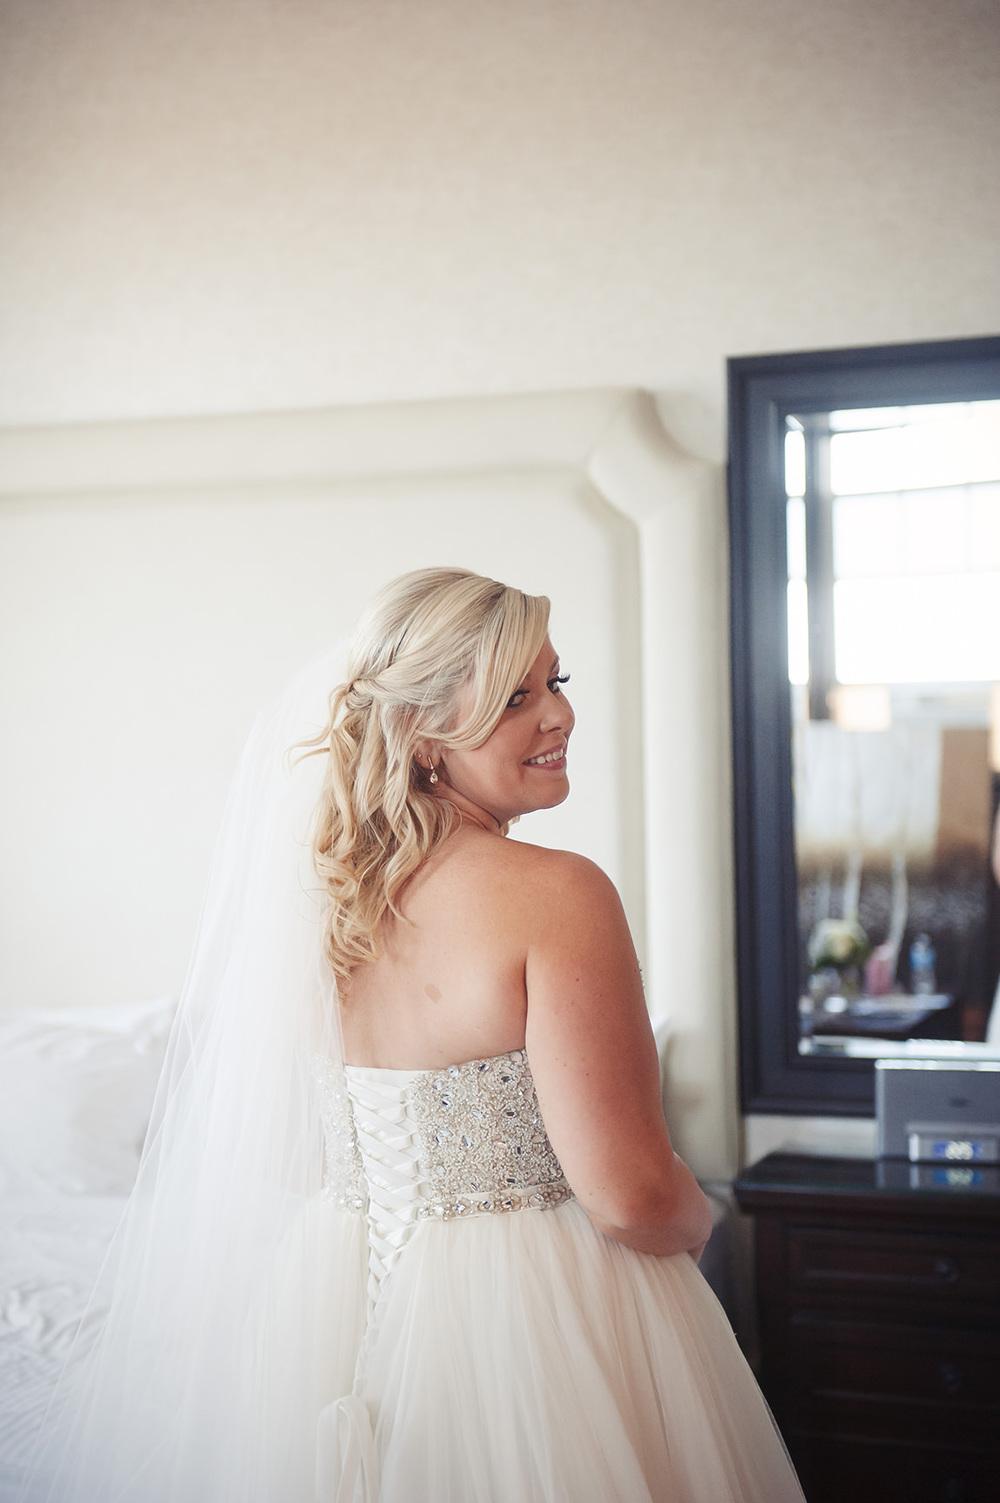 St-Catharines-Wedding-Stone-Mill-Inn-Amy-Darryl-photography-by-Morgan-Falk-018.JPG